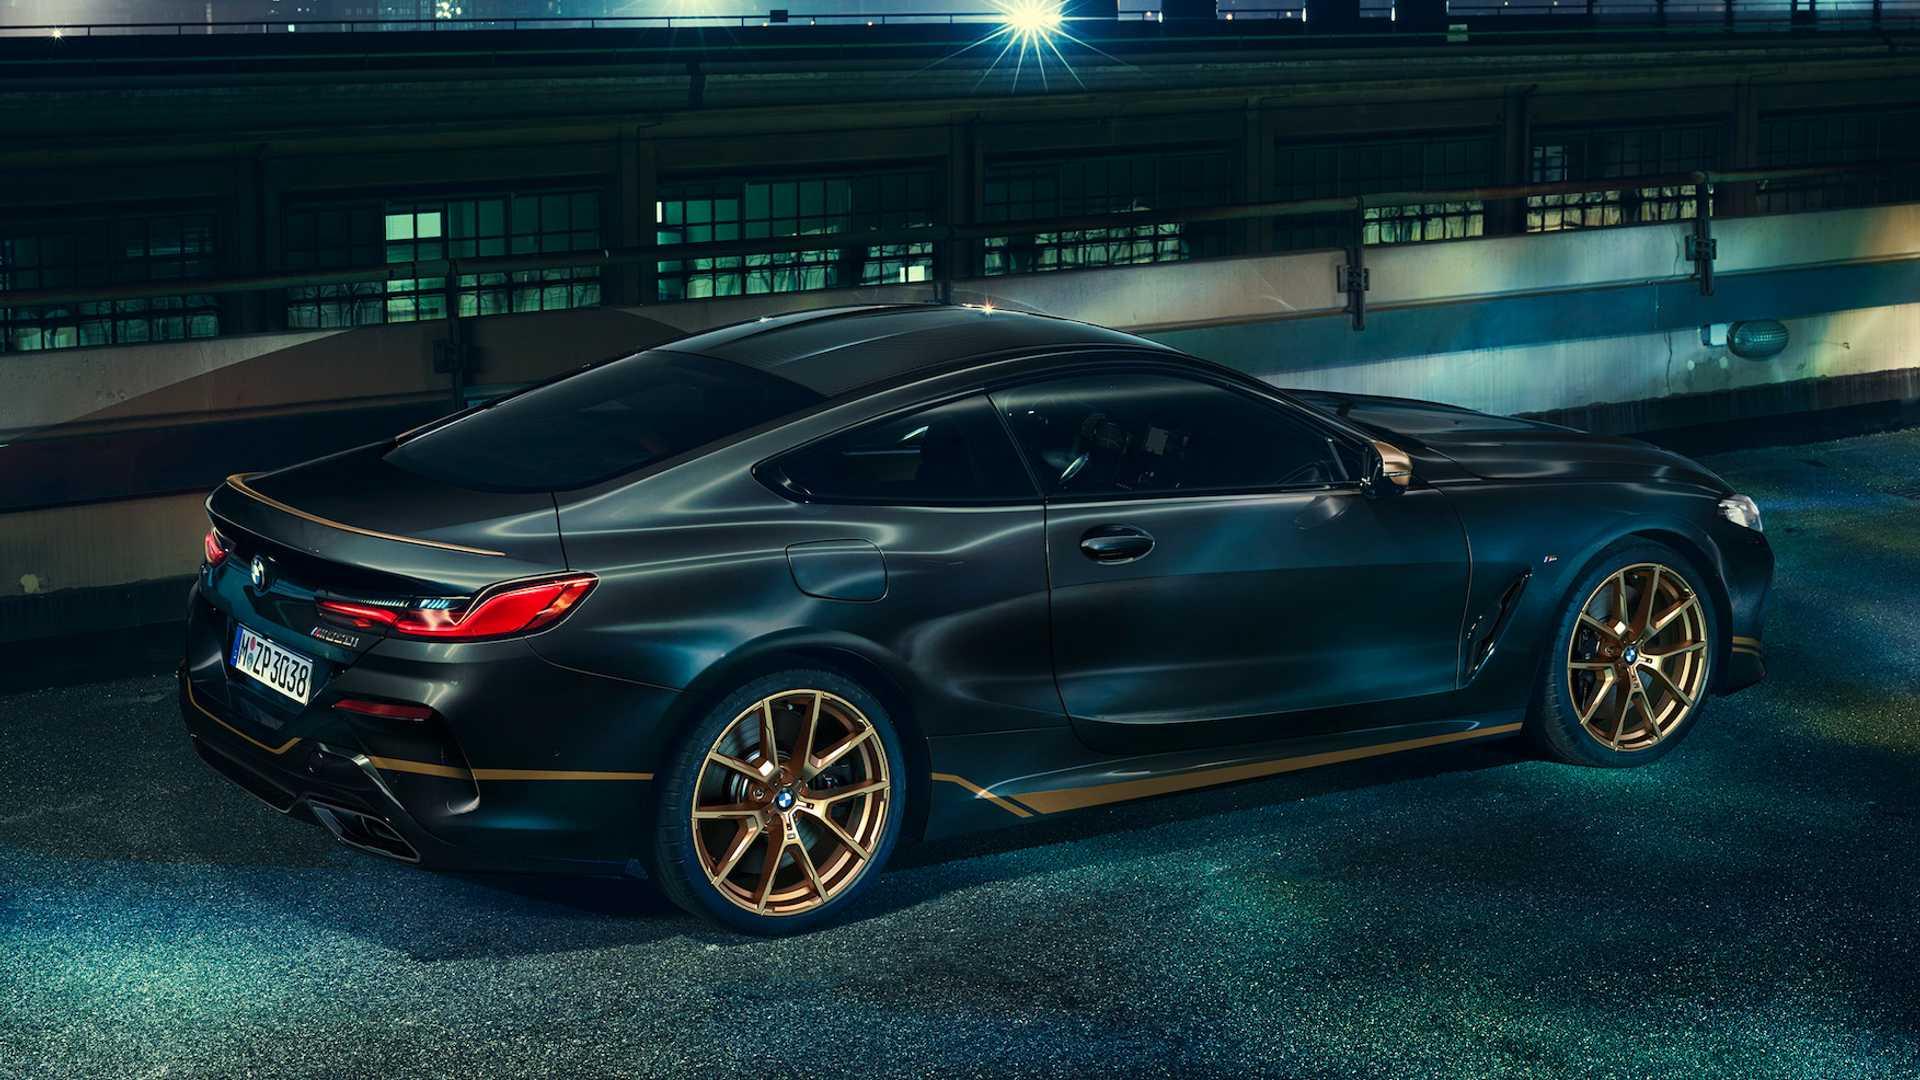 BMW serii 8 Golden Thunder Edition